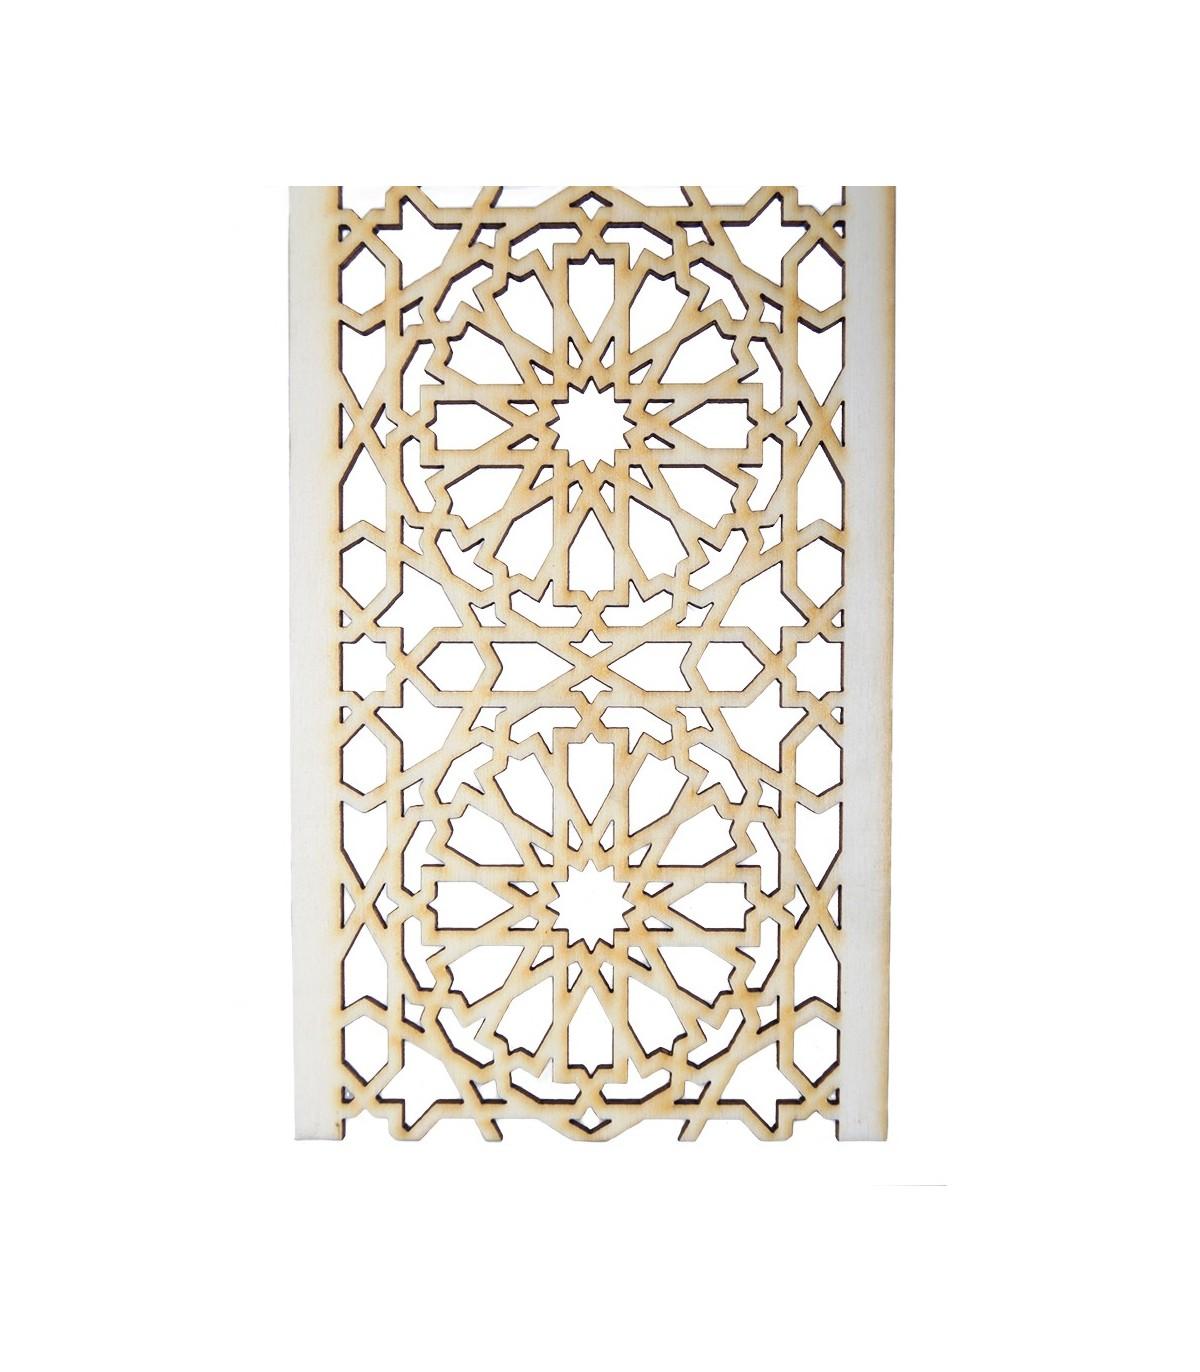 arabische gitter stall holz schneiden mit dem laser modell 1 9 cm. Black Bedroom Furniture Sets. Home Design Ideas